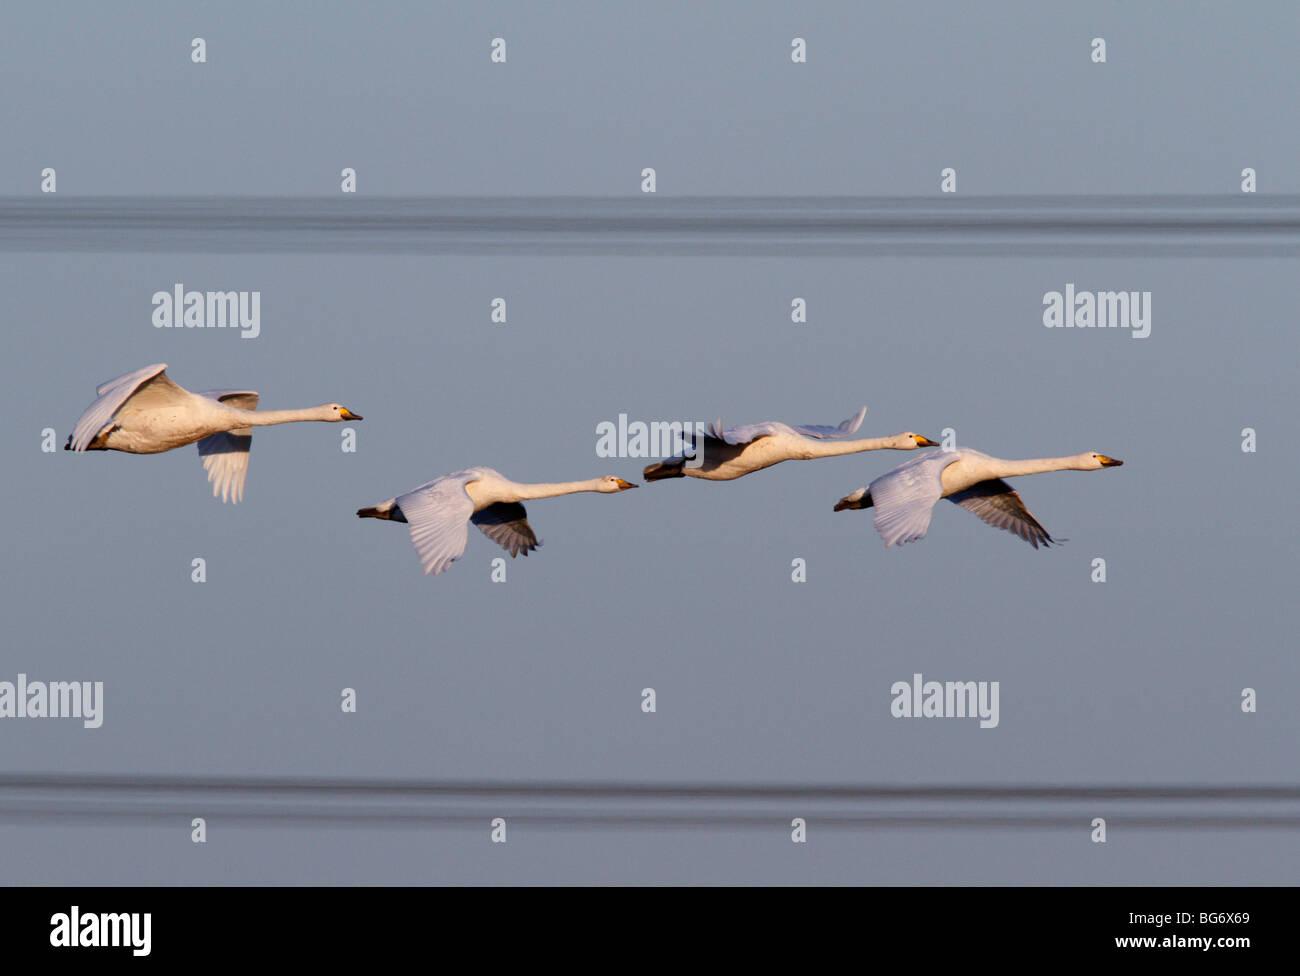 Cisnes cantores Cygnus cygnus vuelo cables de alimentación Imagen De Stock